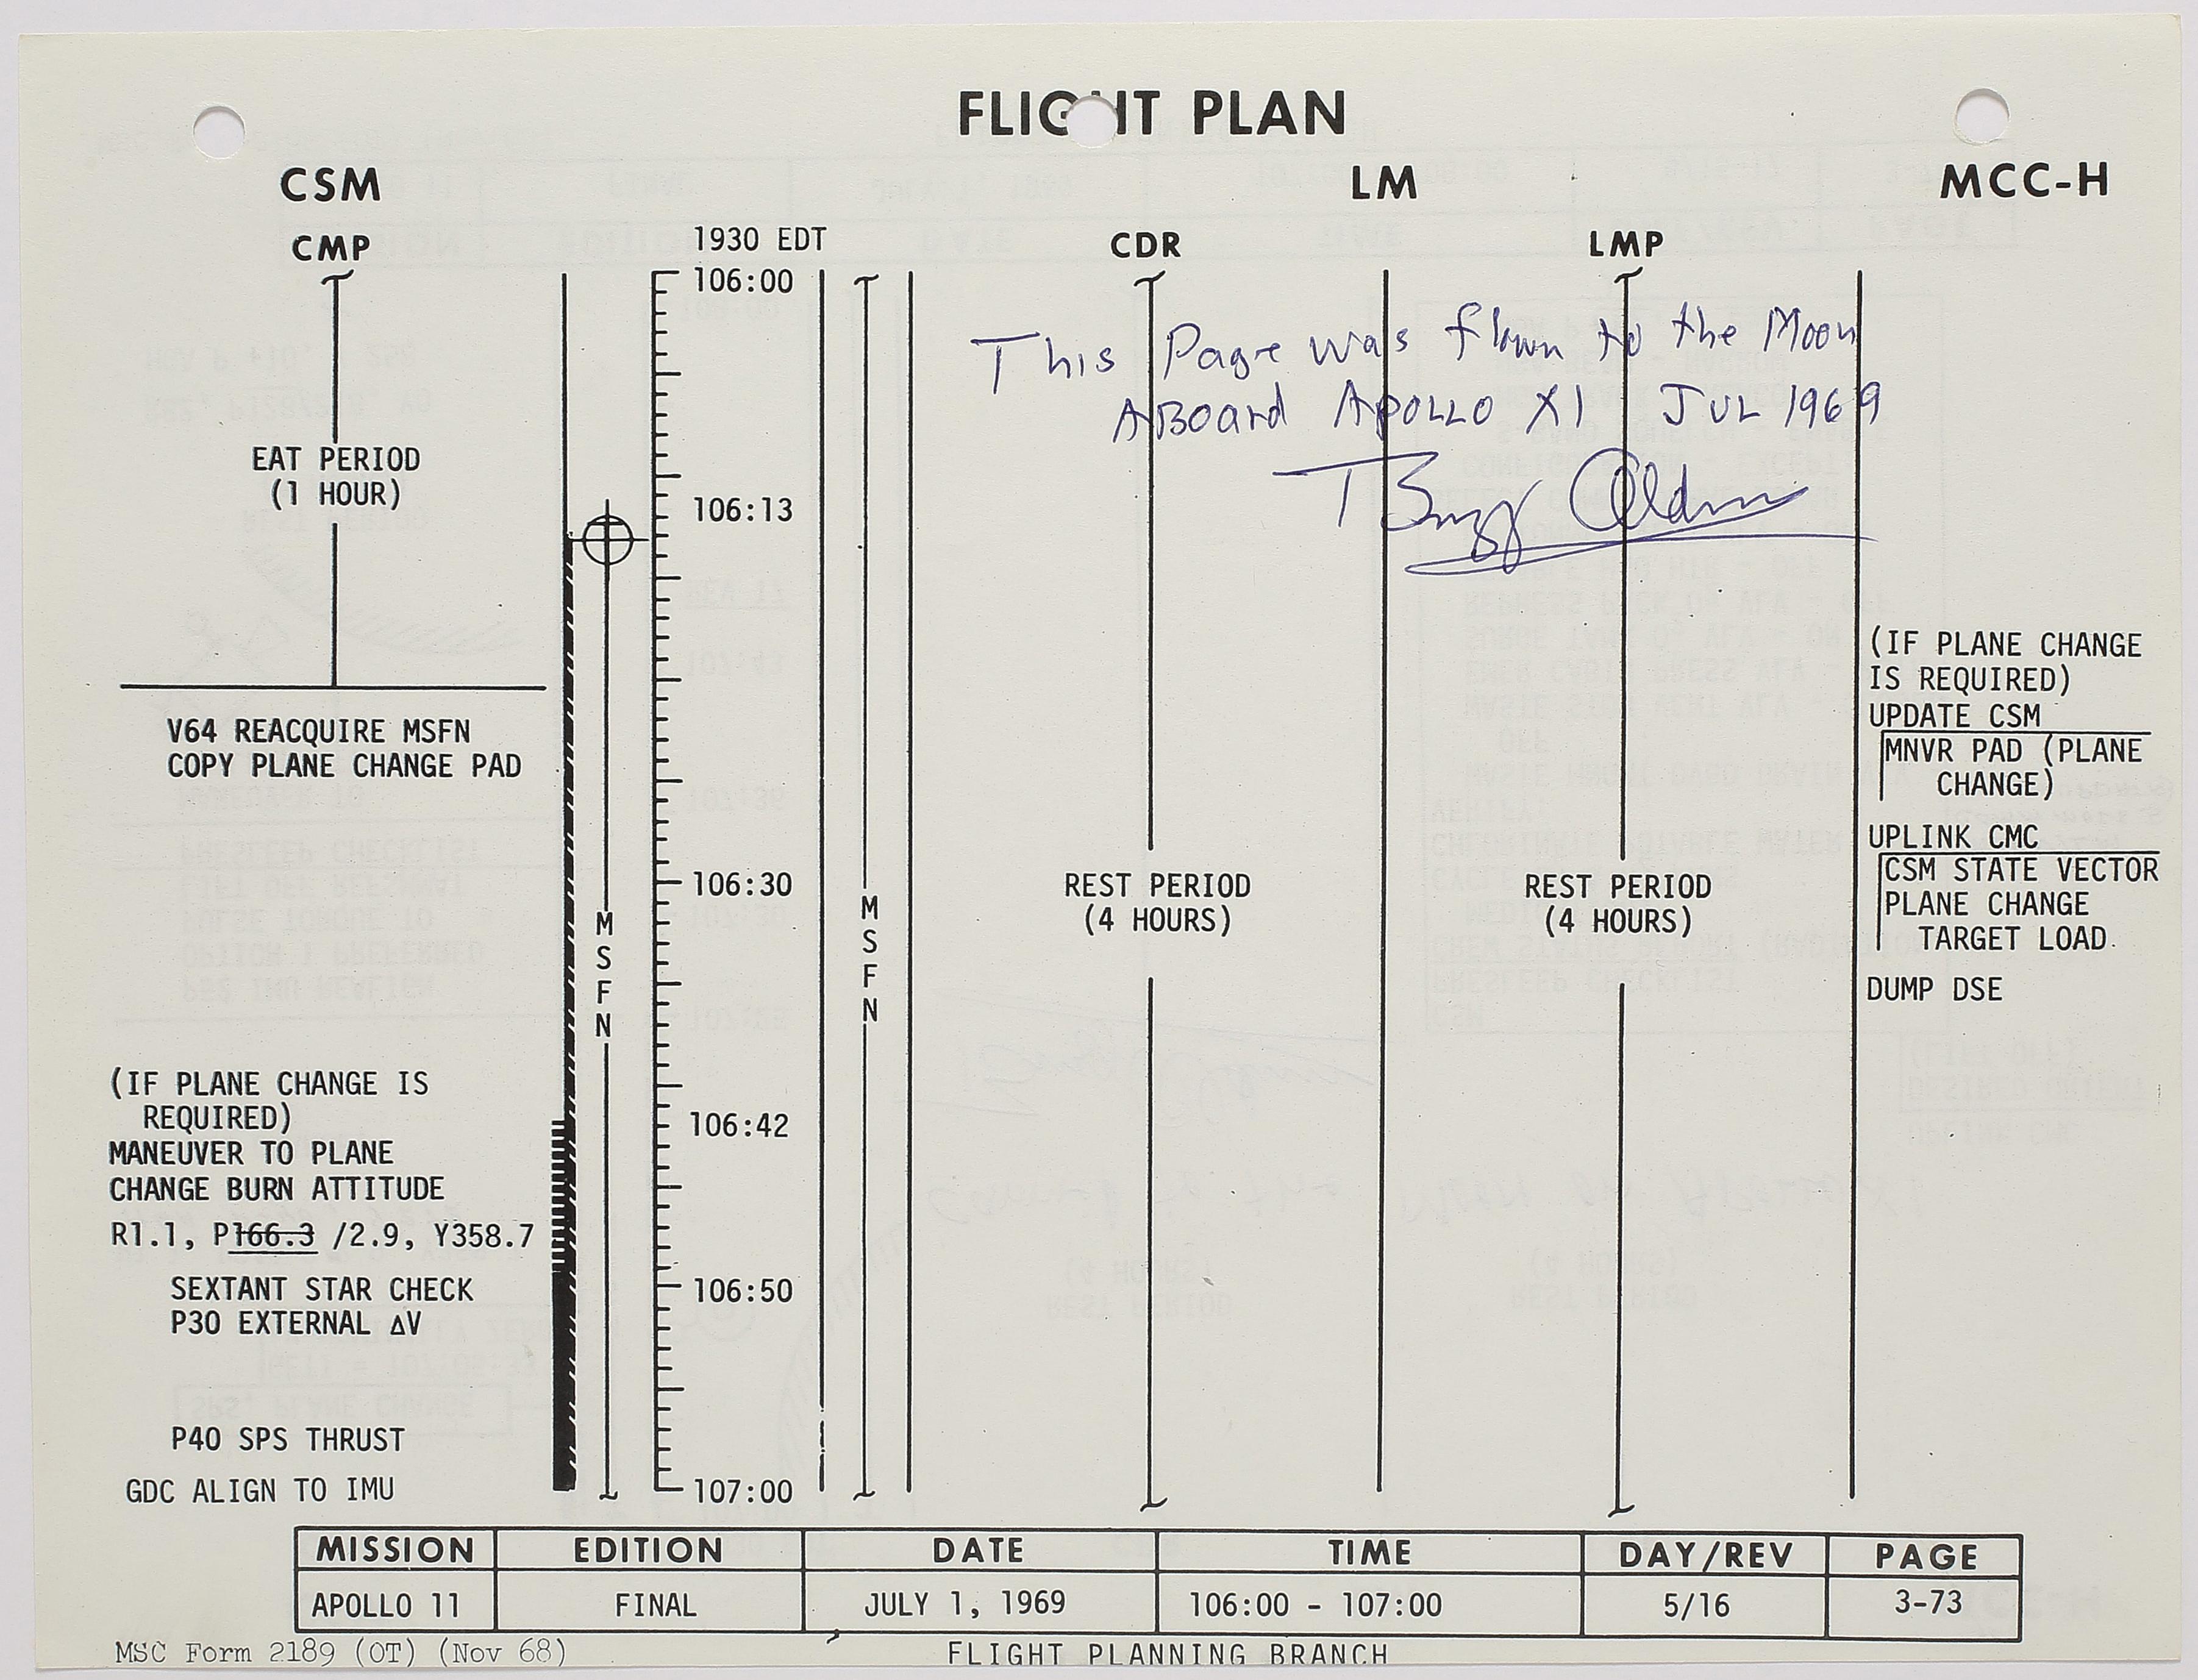 Flown Apollo 11 flight plan sheet. One of the few sheets describing crew activities while on the moon.